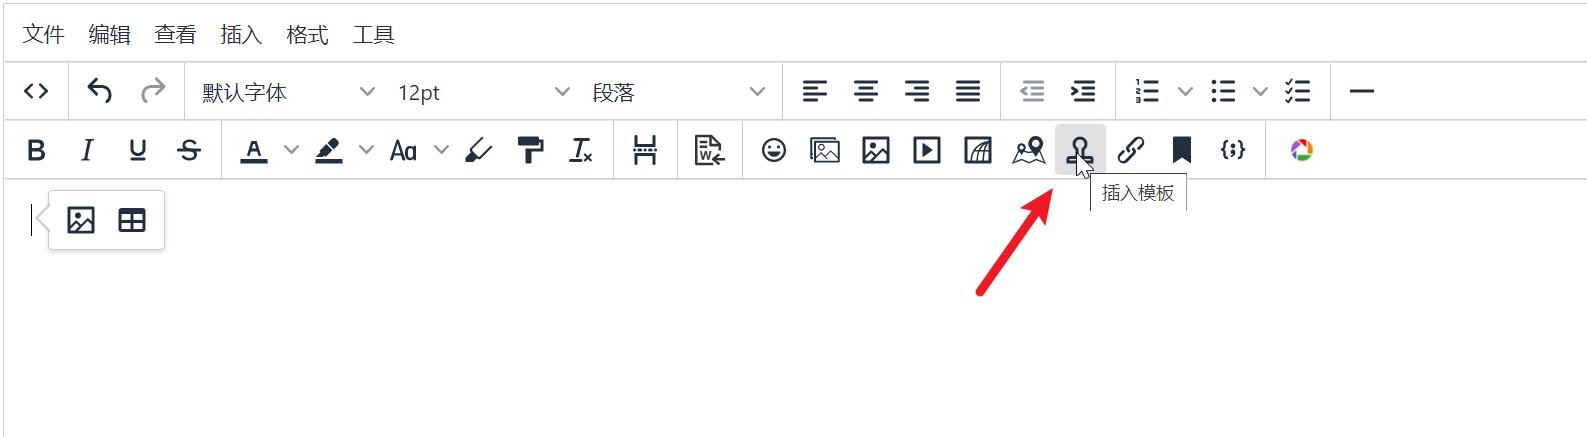 Zblog TinyMCE 富文本编辑器,zblog,第3张